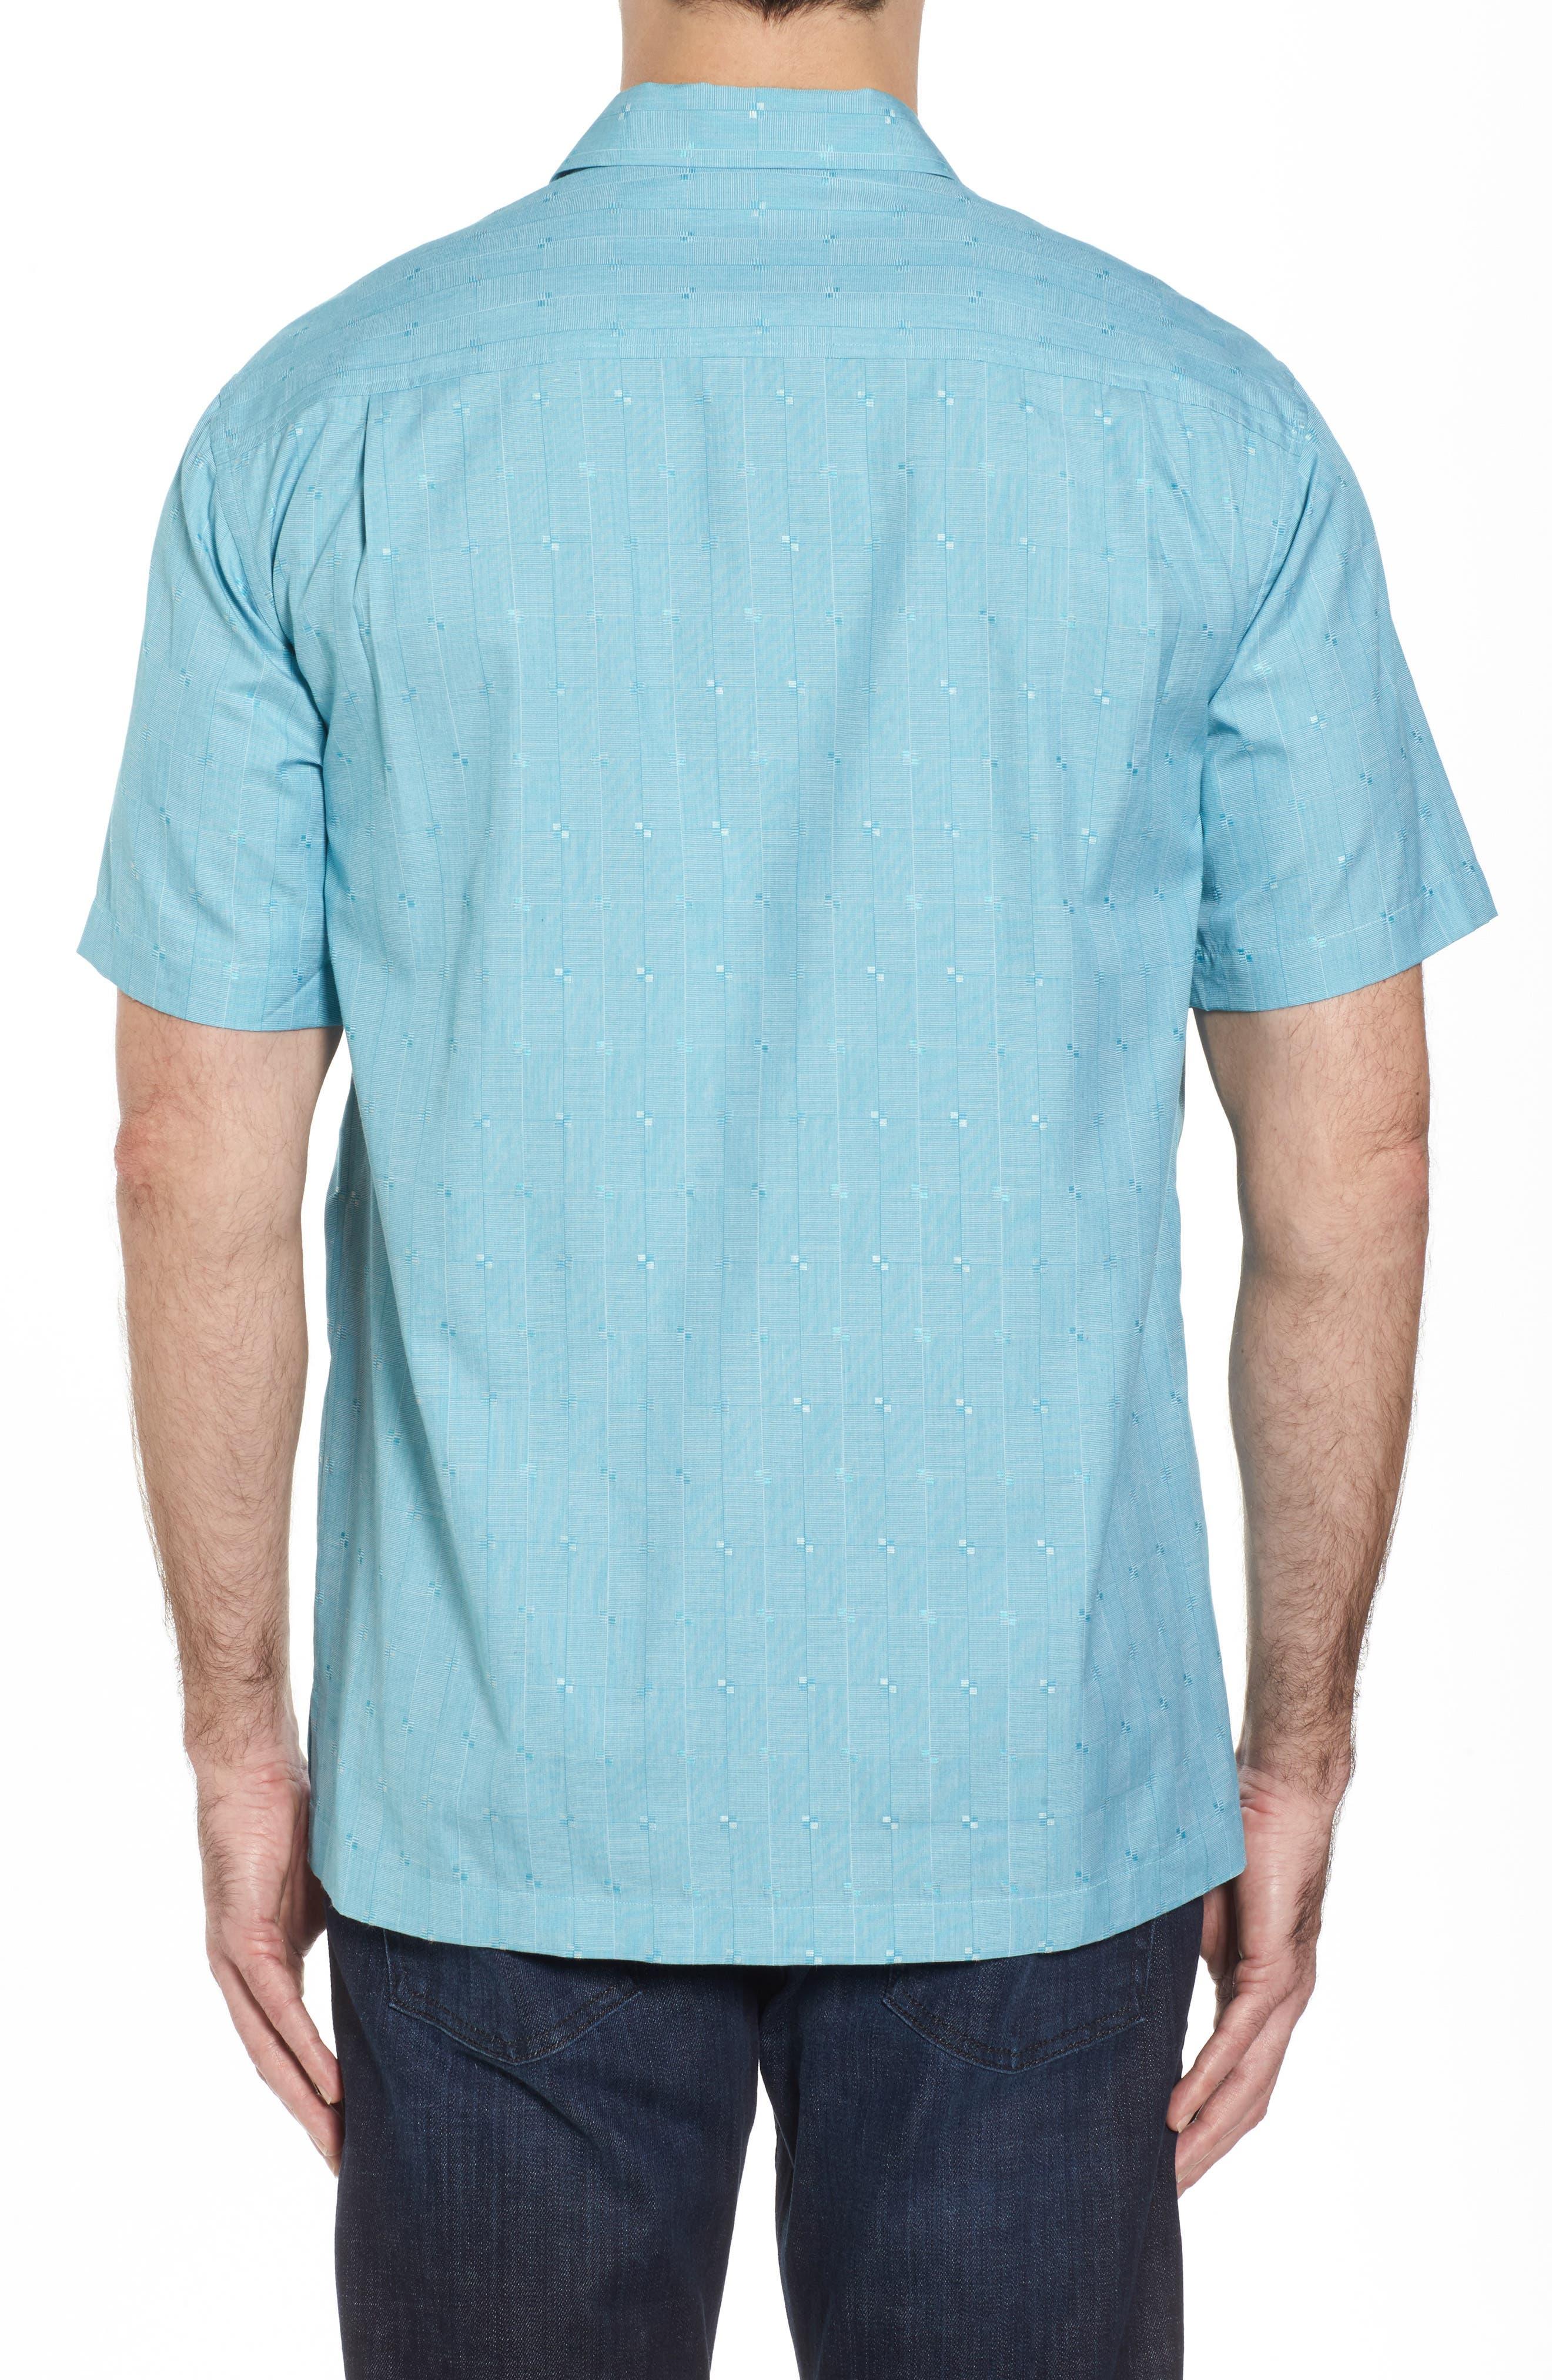 Cypress Sands Camp Shirt,                             Alternate thumbnail 2, color,